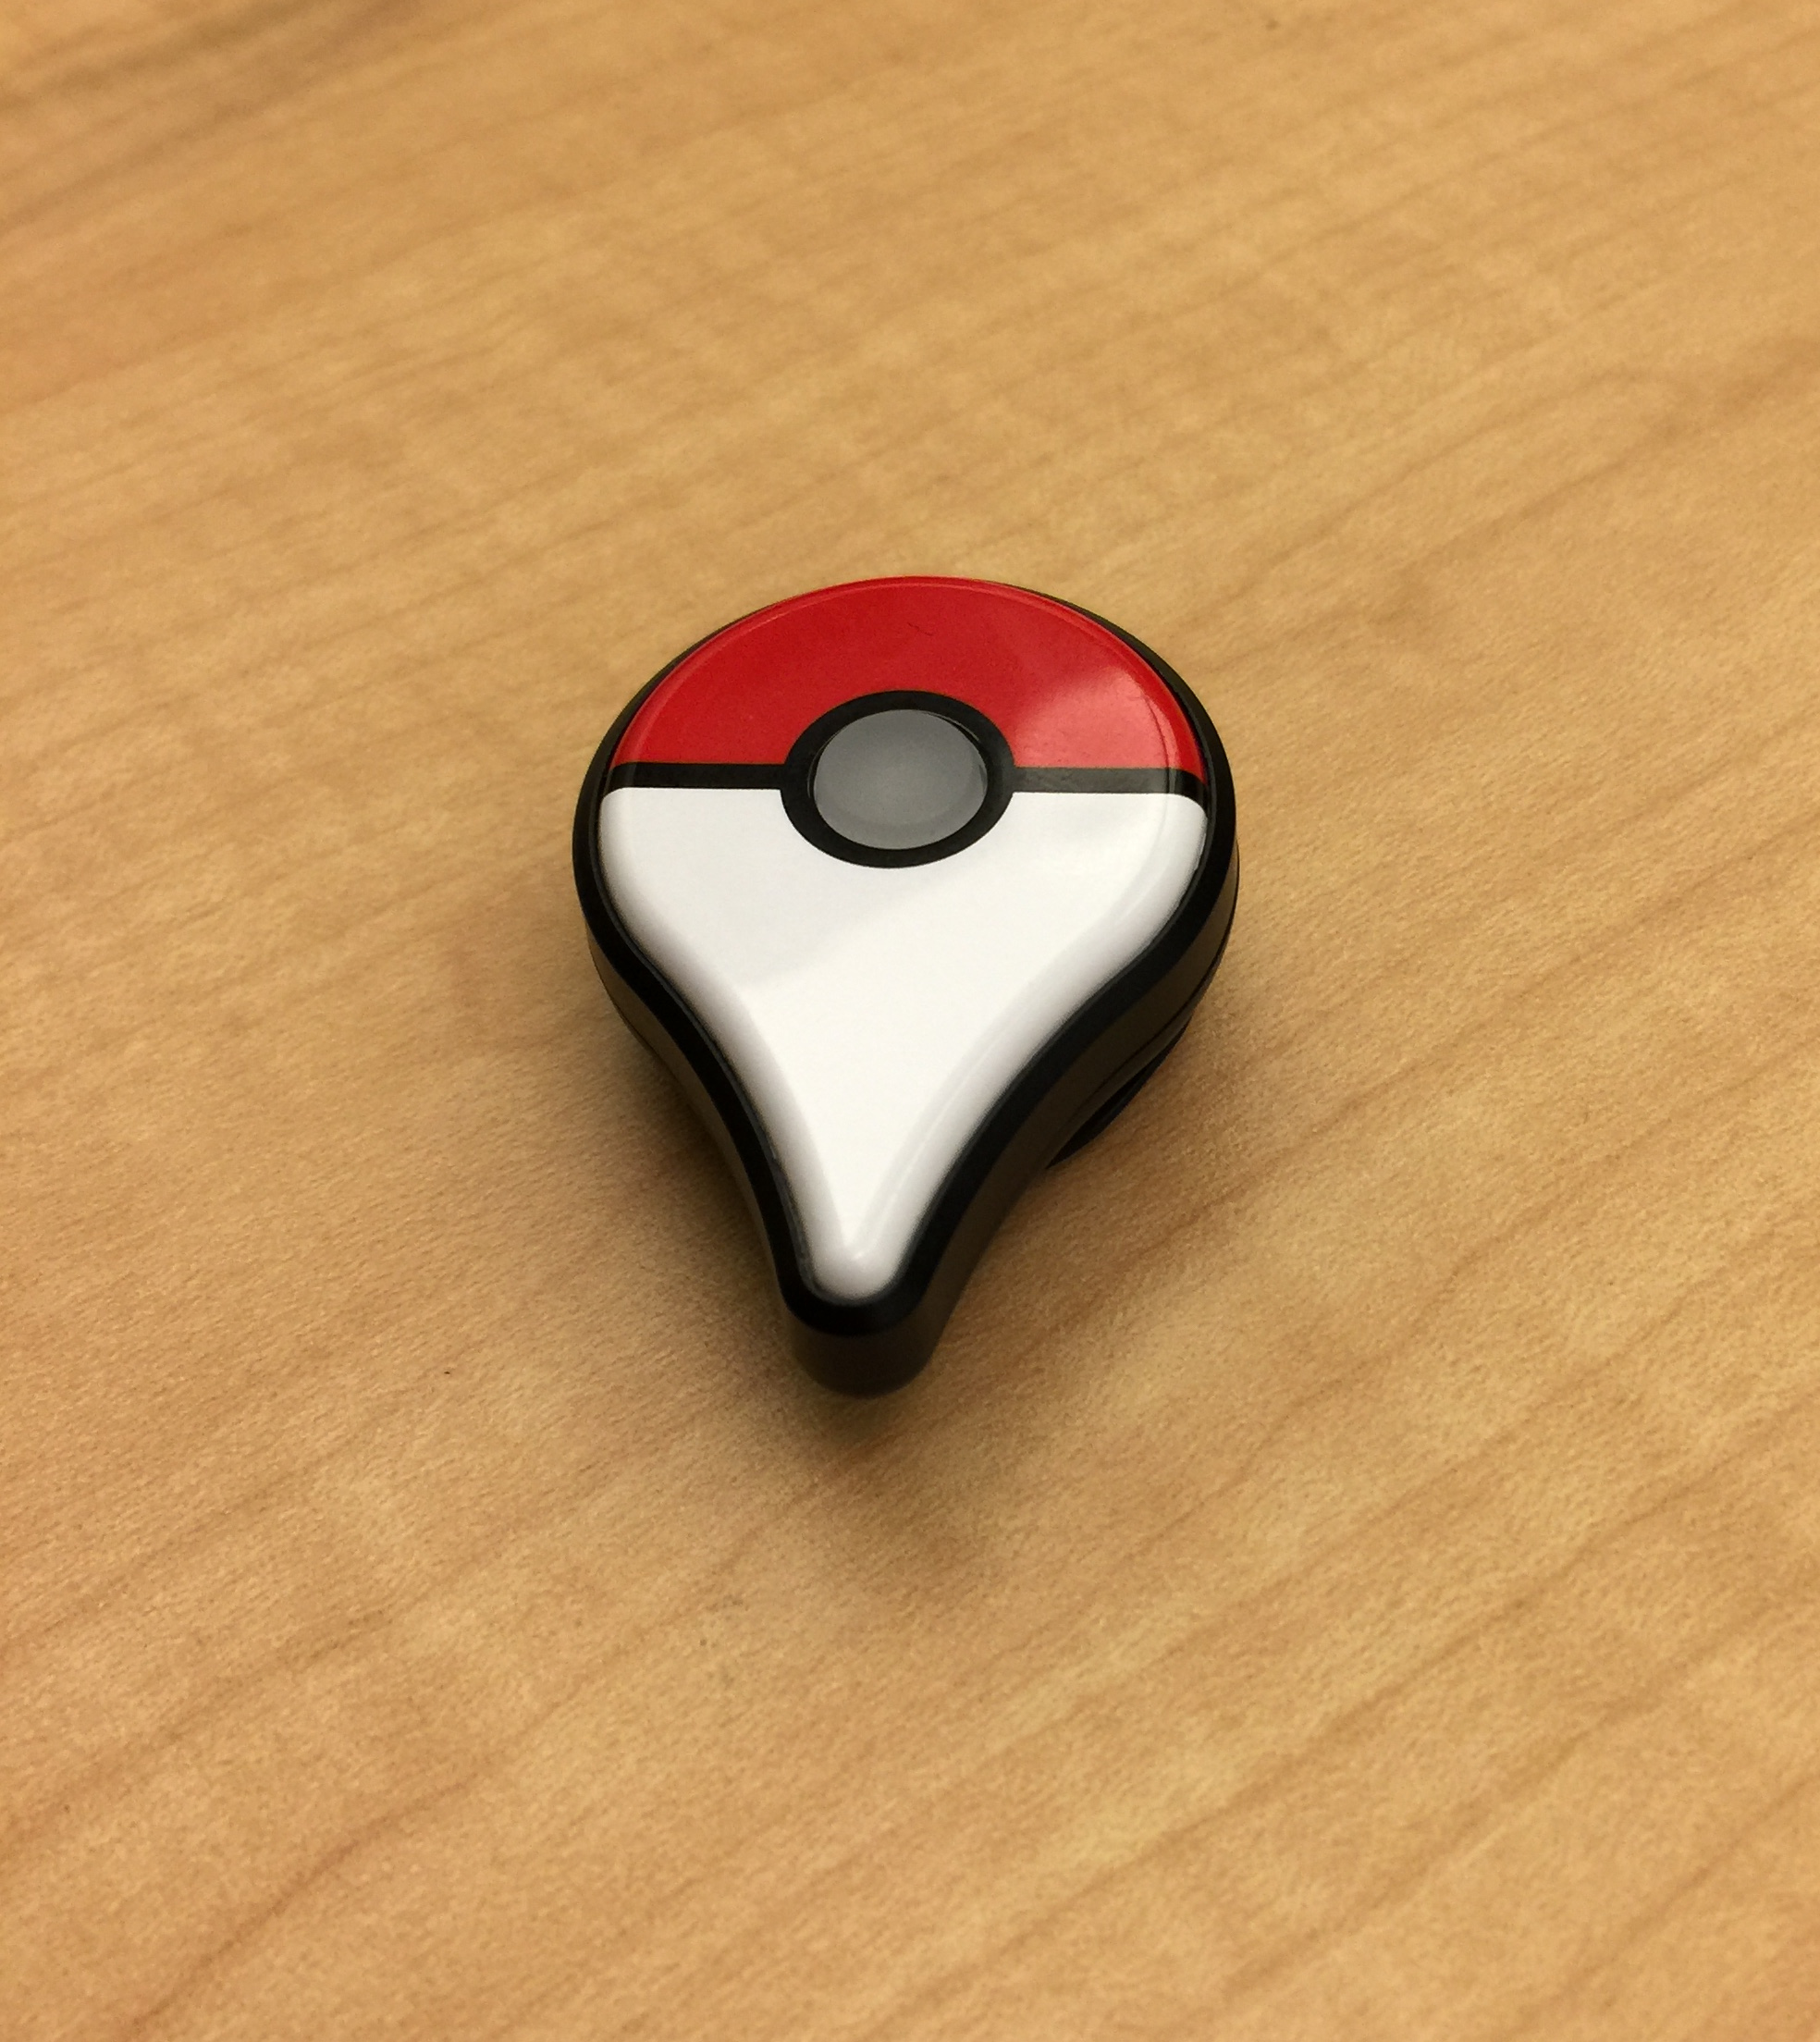 pokemon go plus how to use